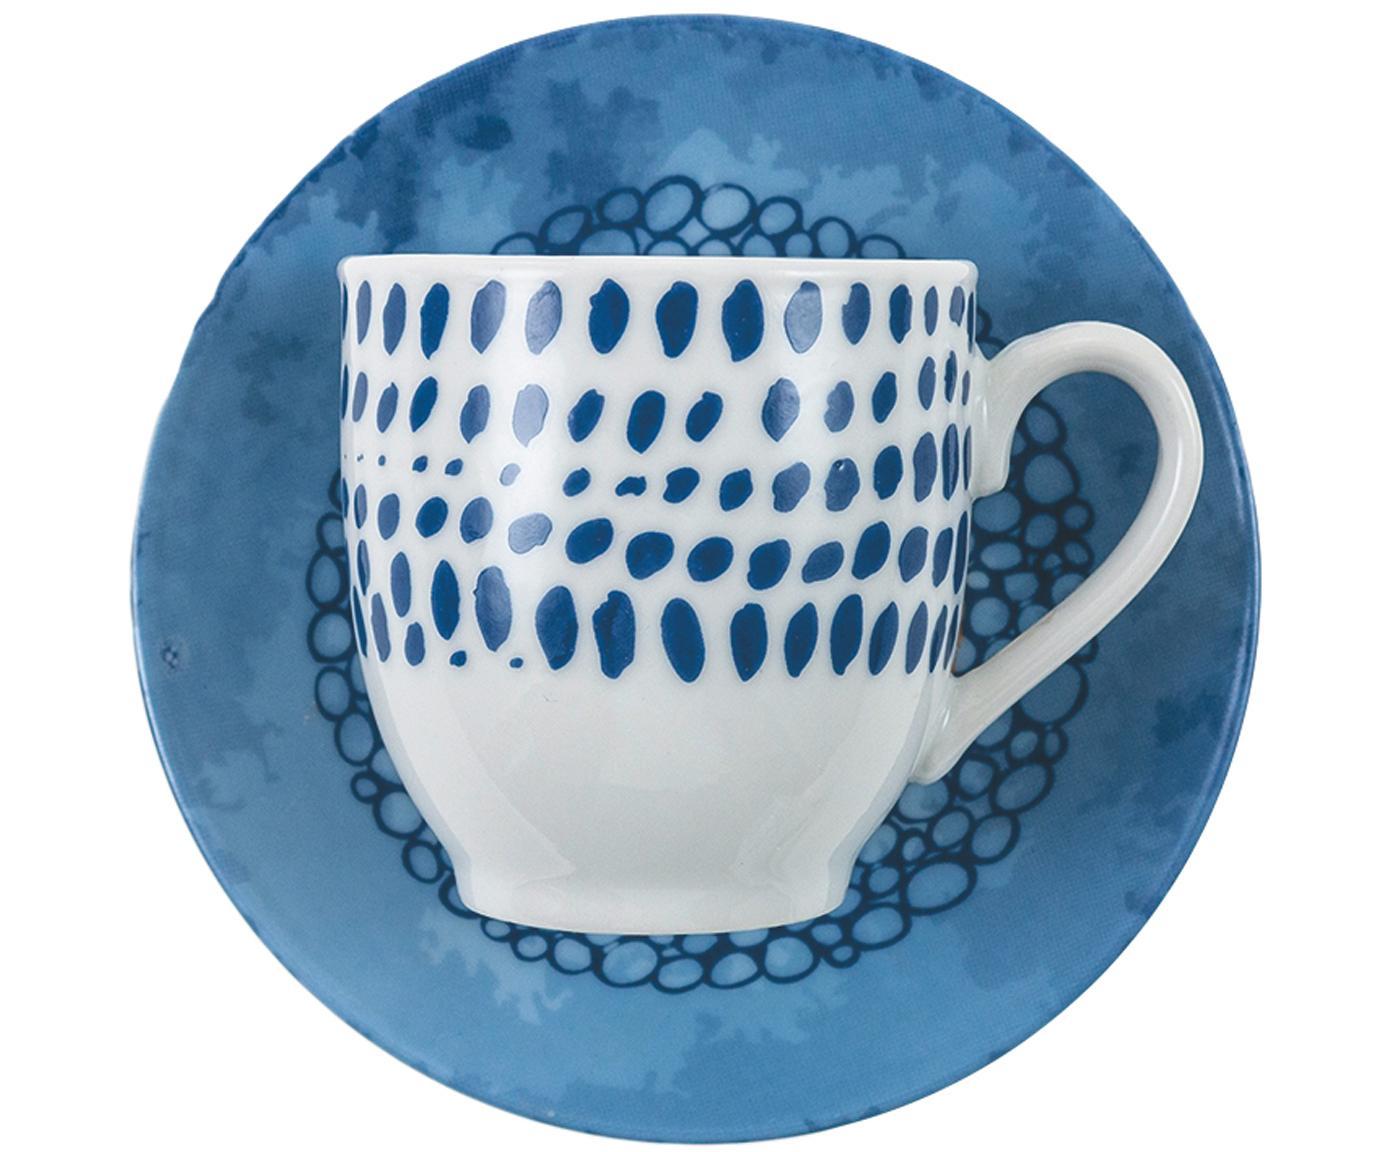 Set tazze da espresso Marea 12 pz, Porcellana, Blu, bianco, giallo, Ø 6 x Alt. 6 cm